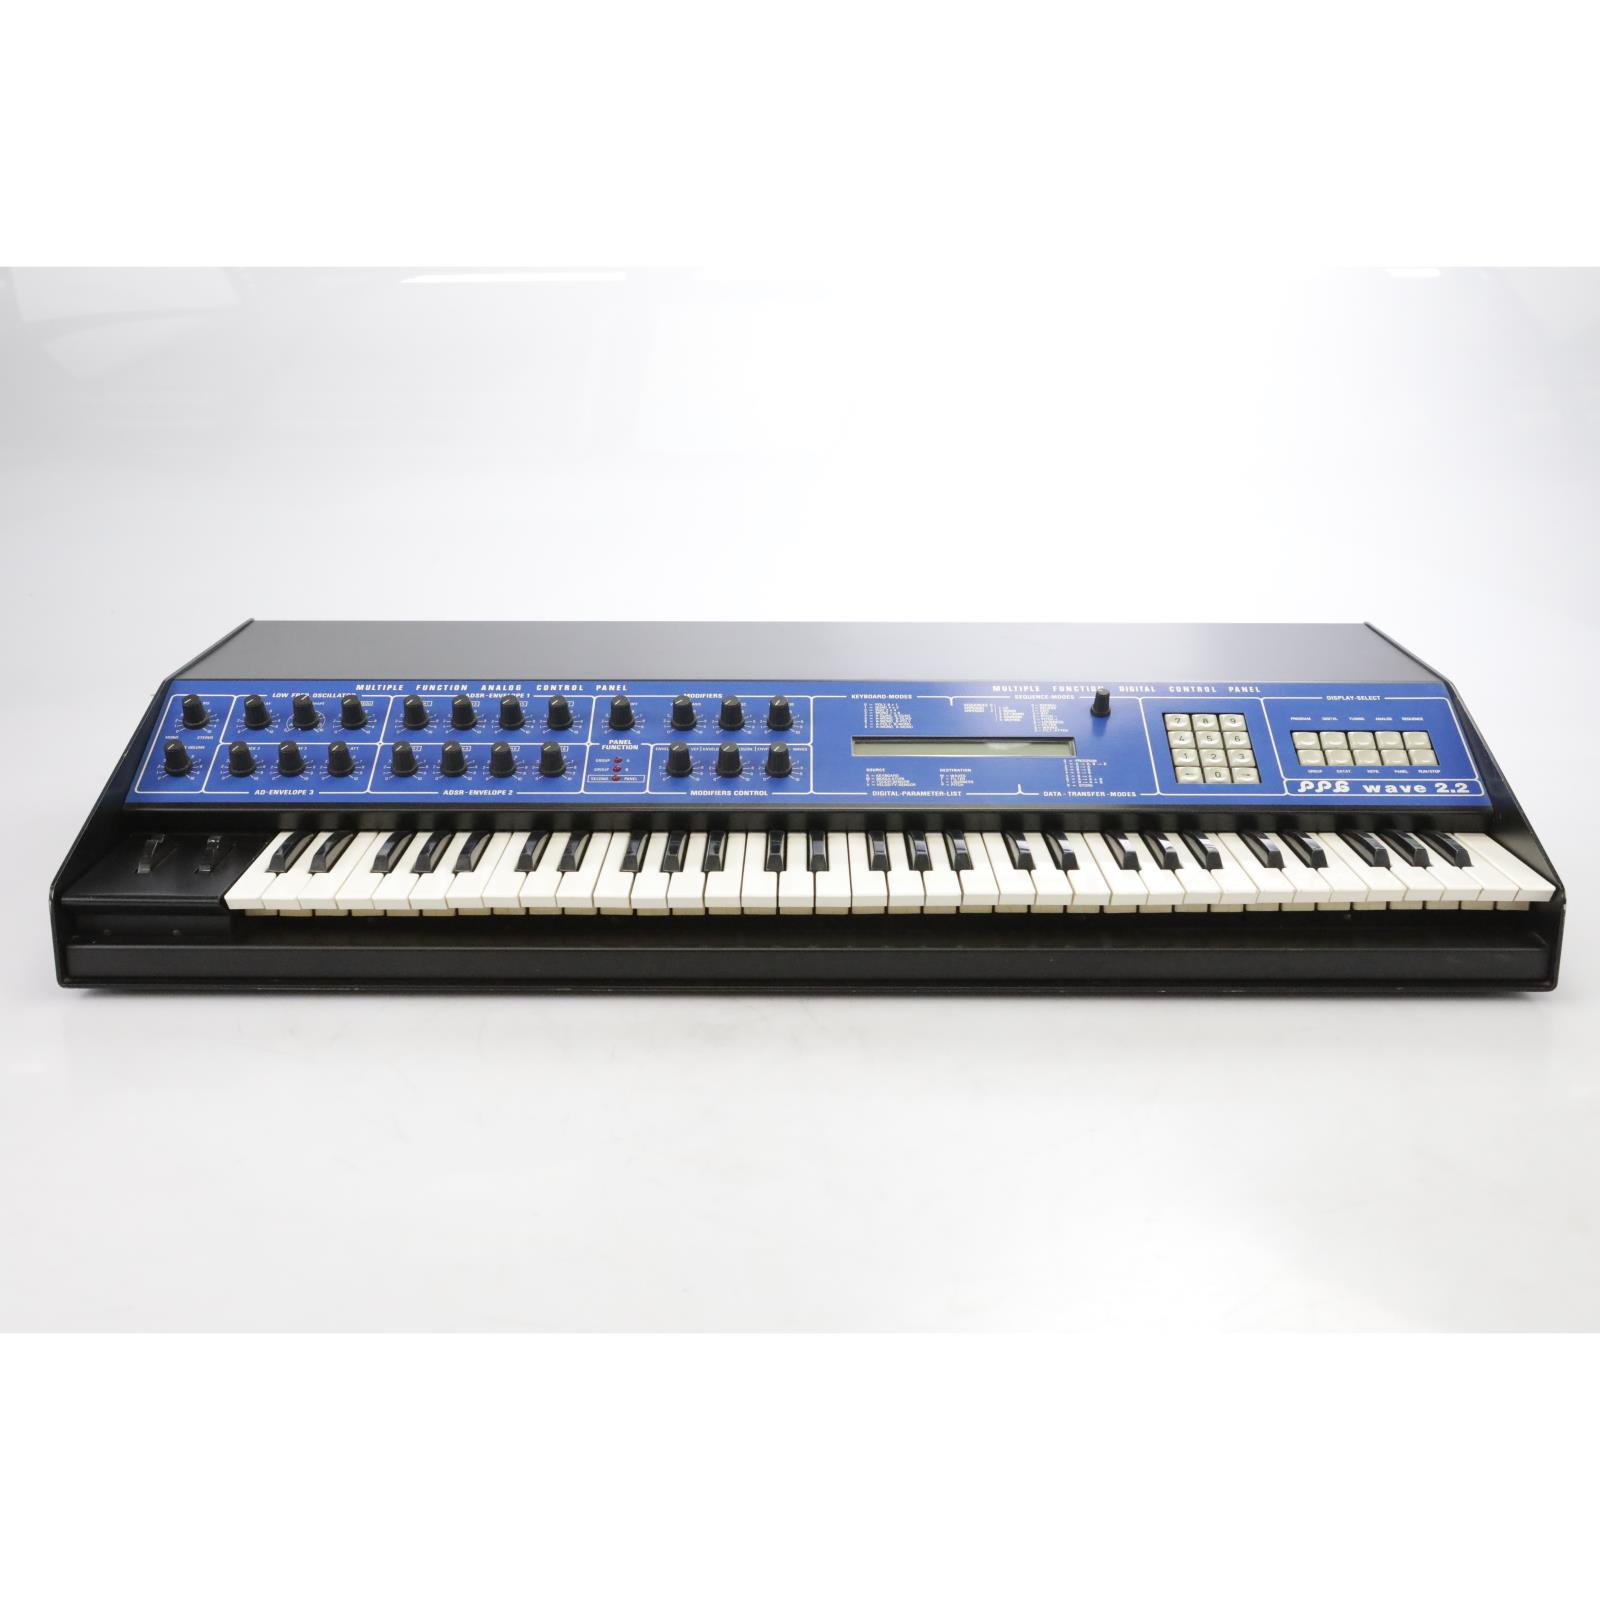 PPG Wave 2.2 Keyboard Analog Digital Synthesizer w/ MIDI #44402